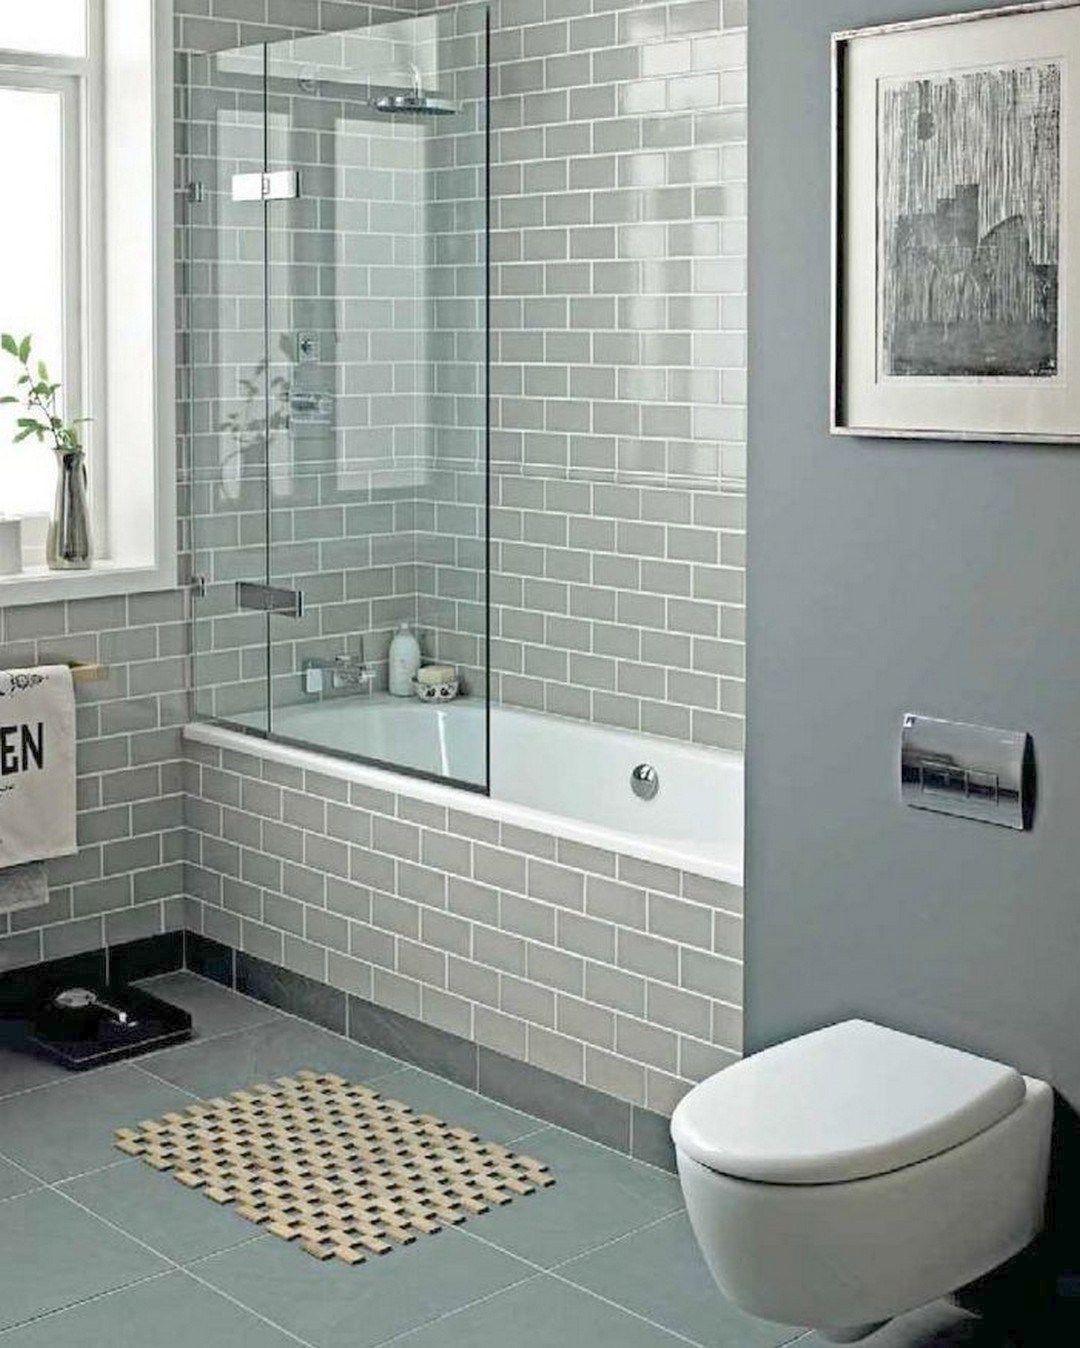 Bathroom Ideas Earth Tones time Bathroom Grab Bars for